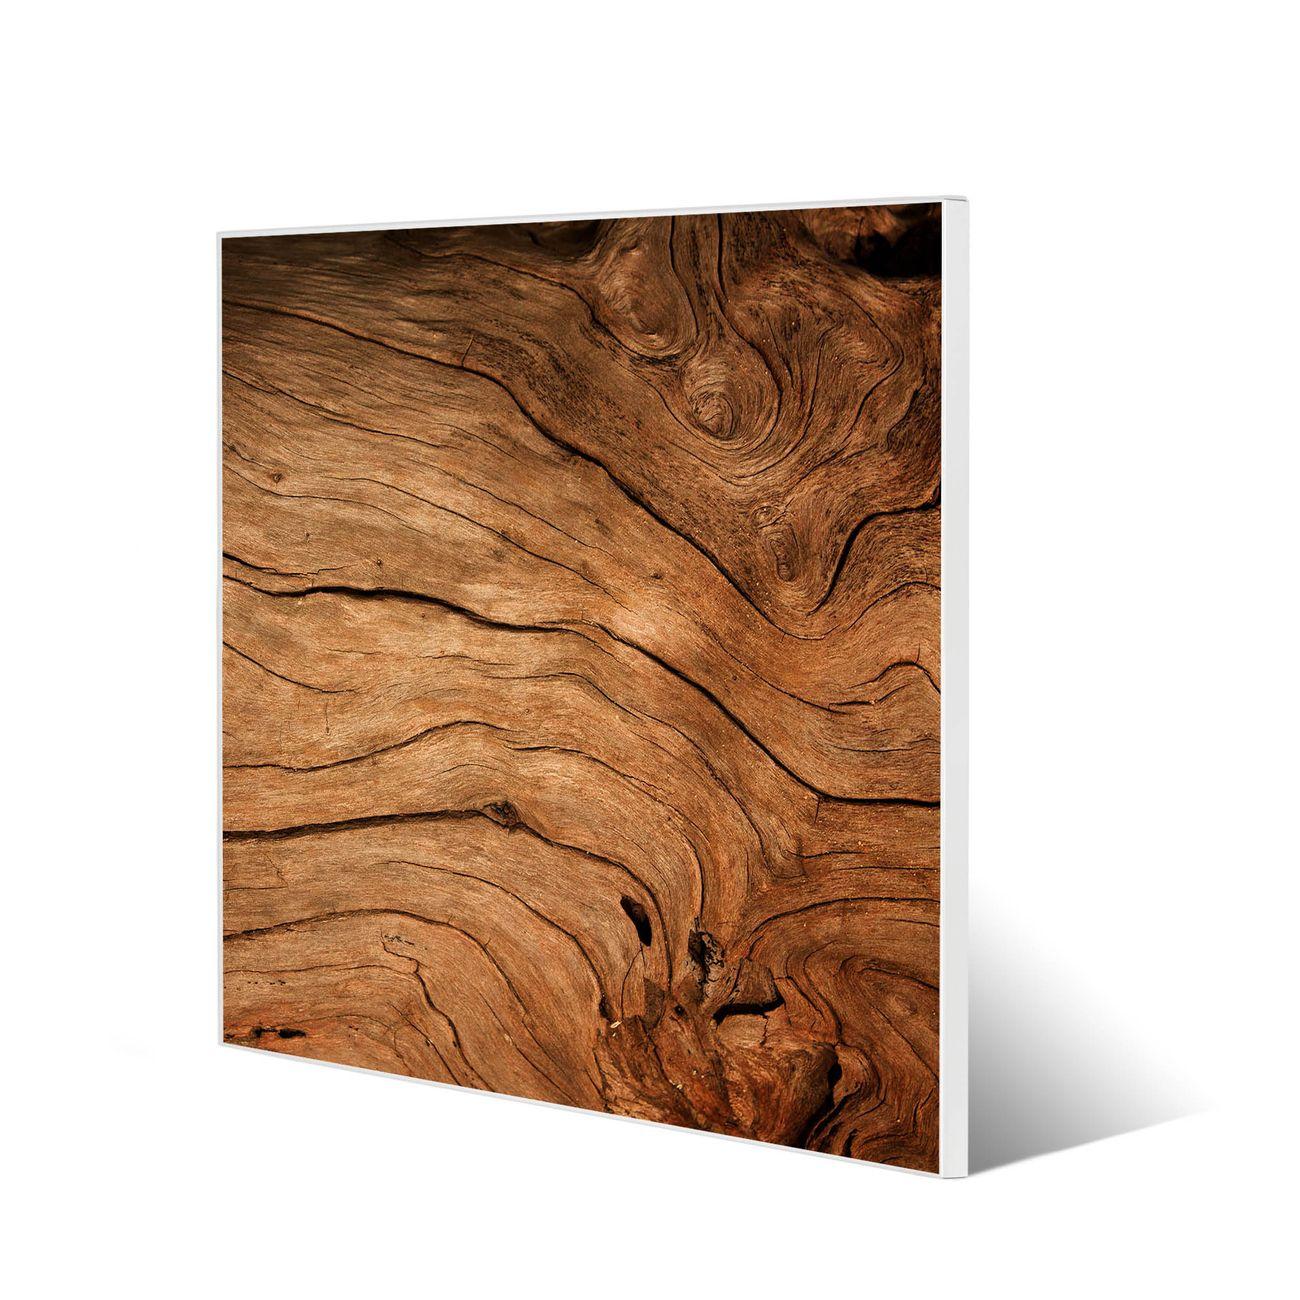 Stahl Magnettafel 50x50 Motiv Trockenes Holz